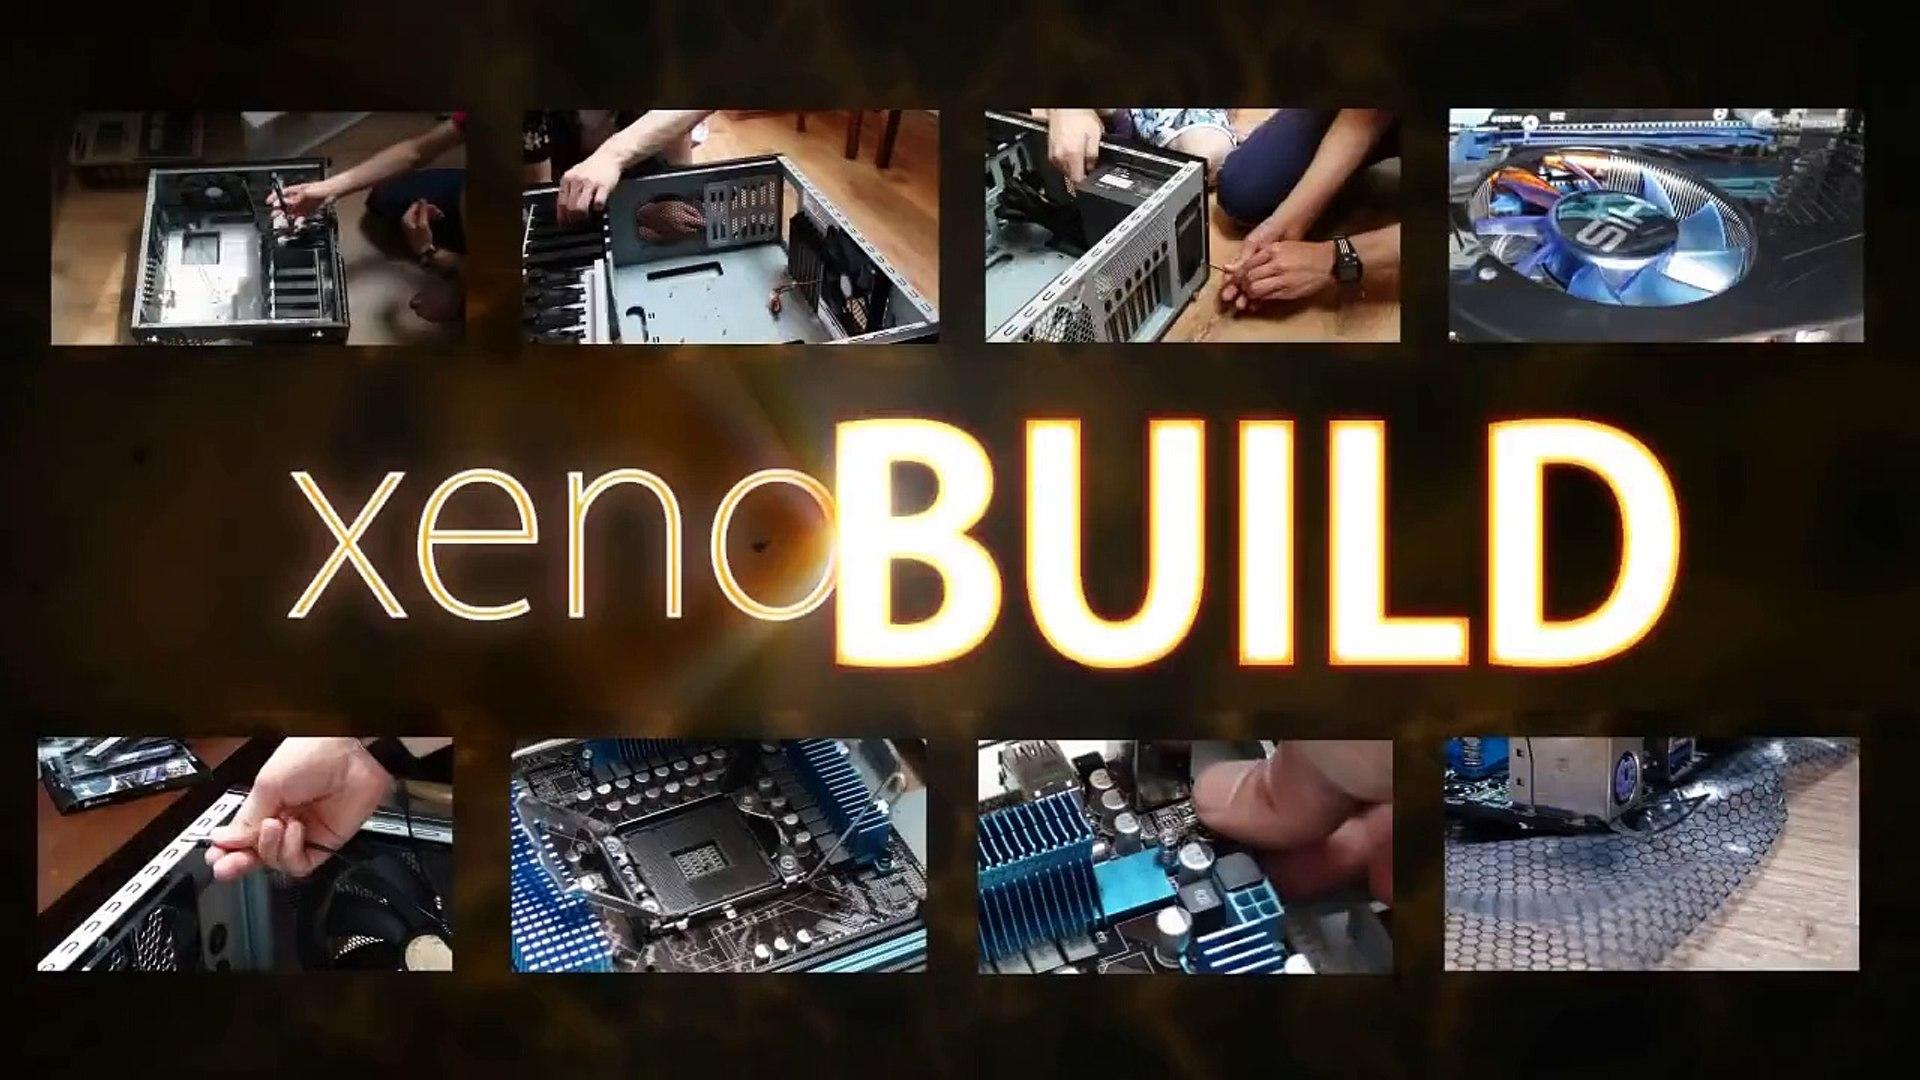 xenoBUILD - Unboxing & Installing Intel i7 920 CPU